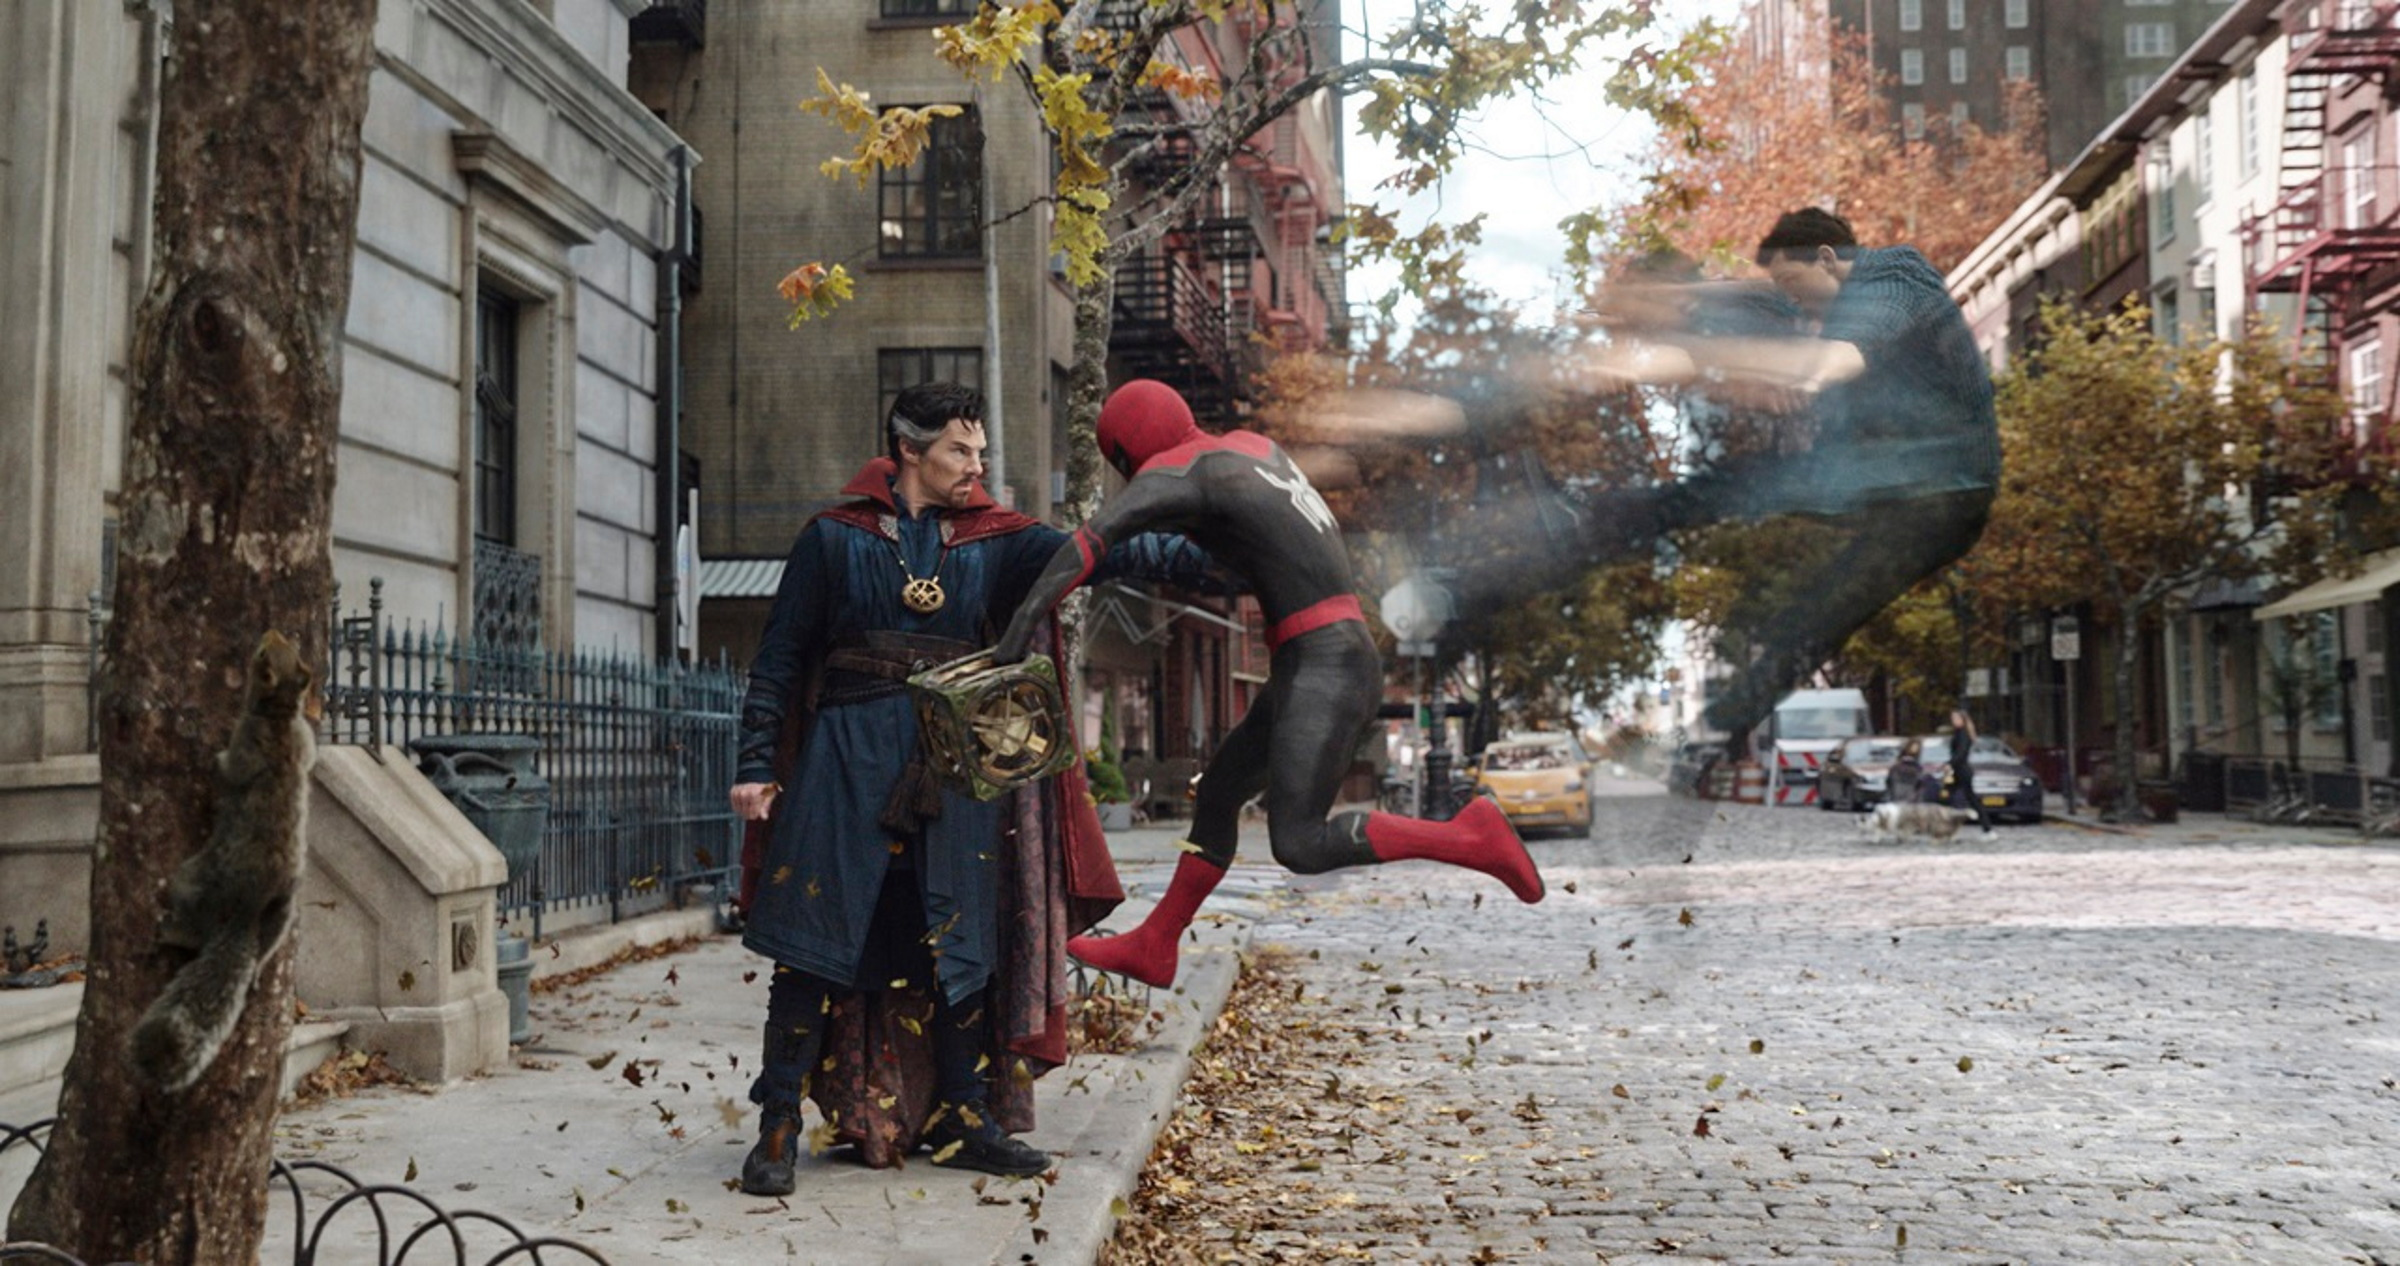 Spider-Man: No Way Home Trailer Reveals The Multiverse